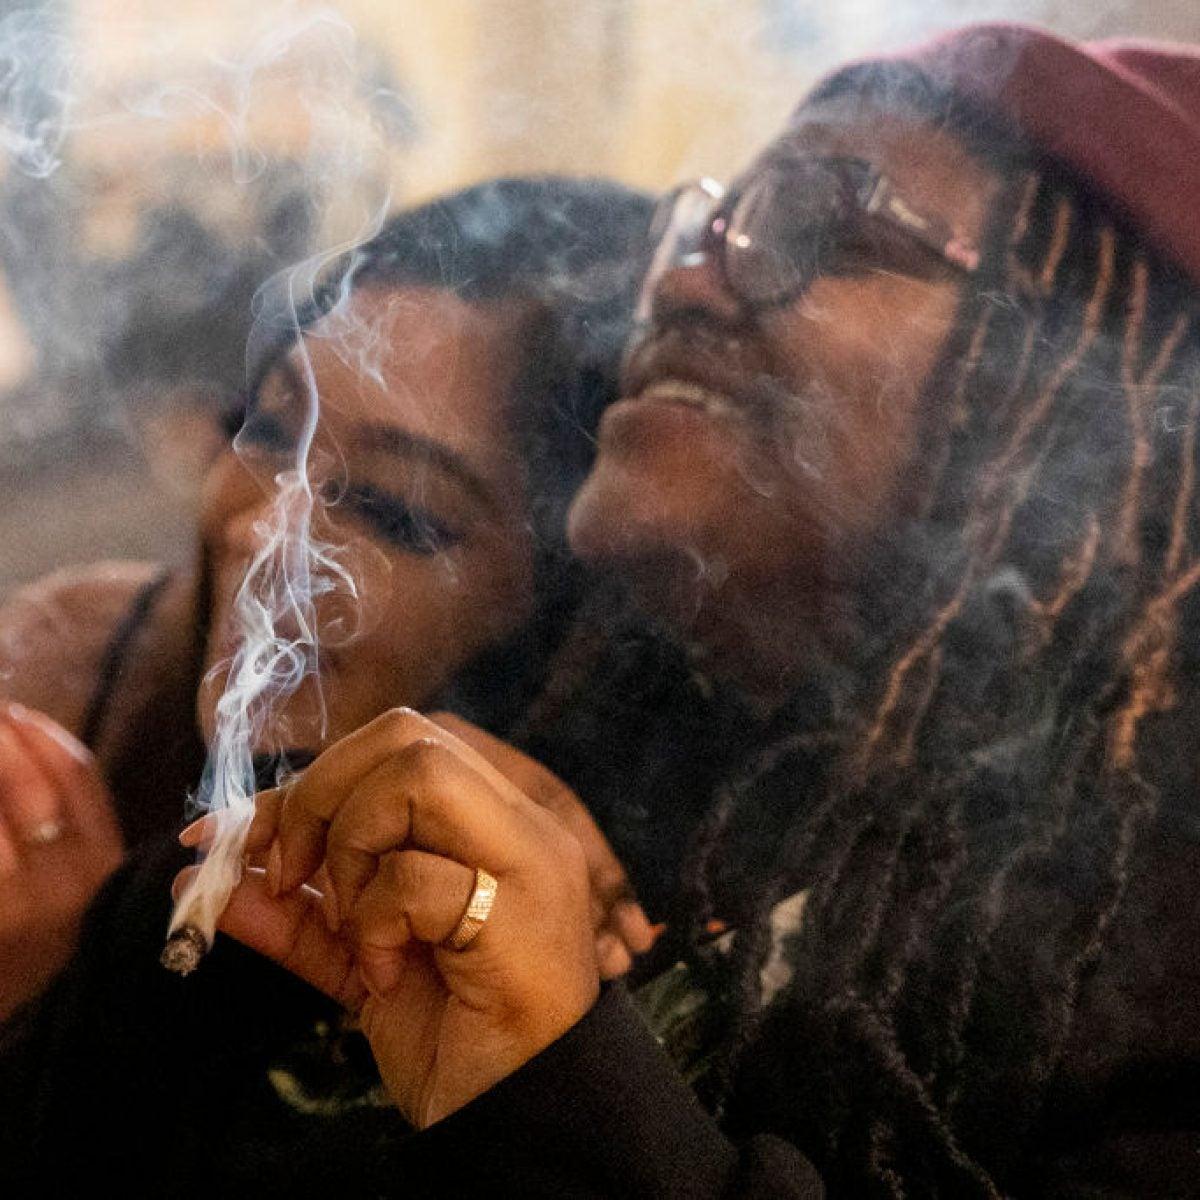 Marijuana Decriminalization Passes House